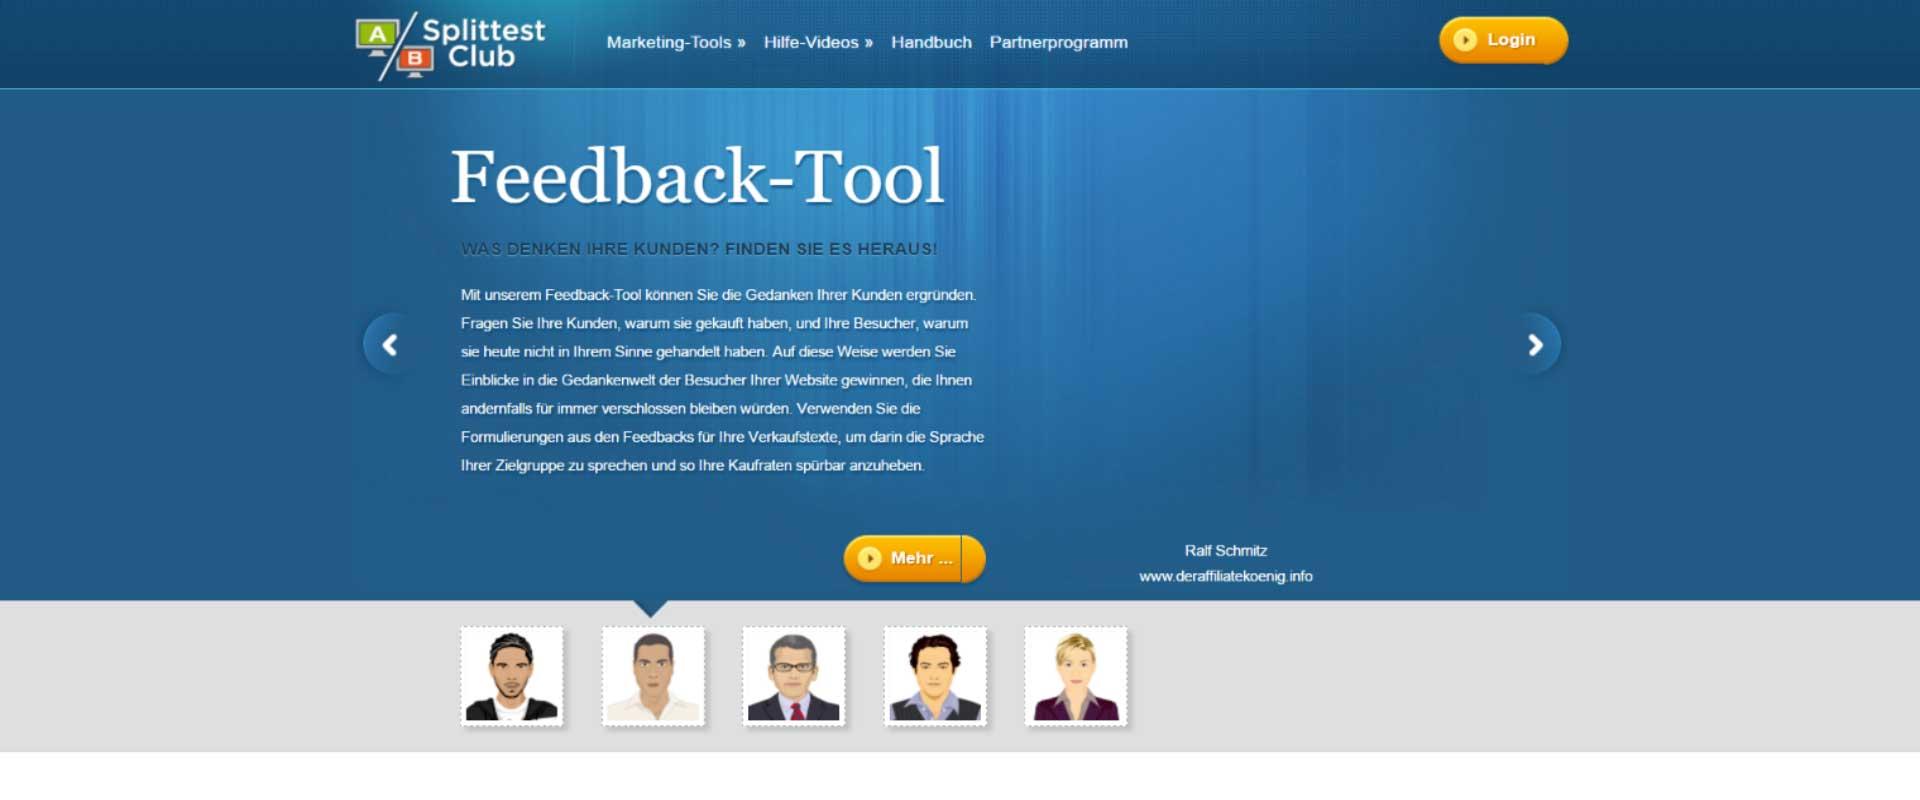 Das Feedback-Tool